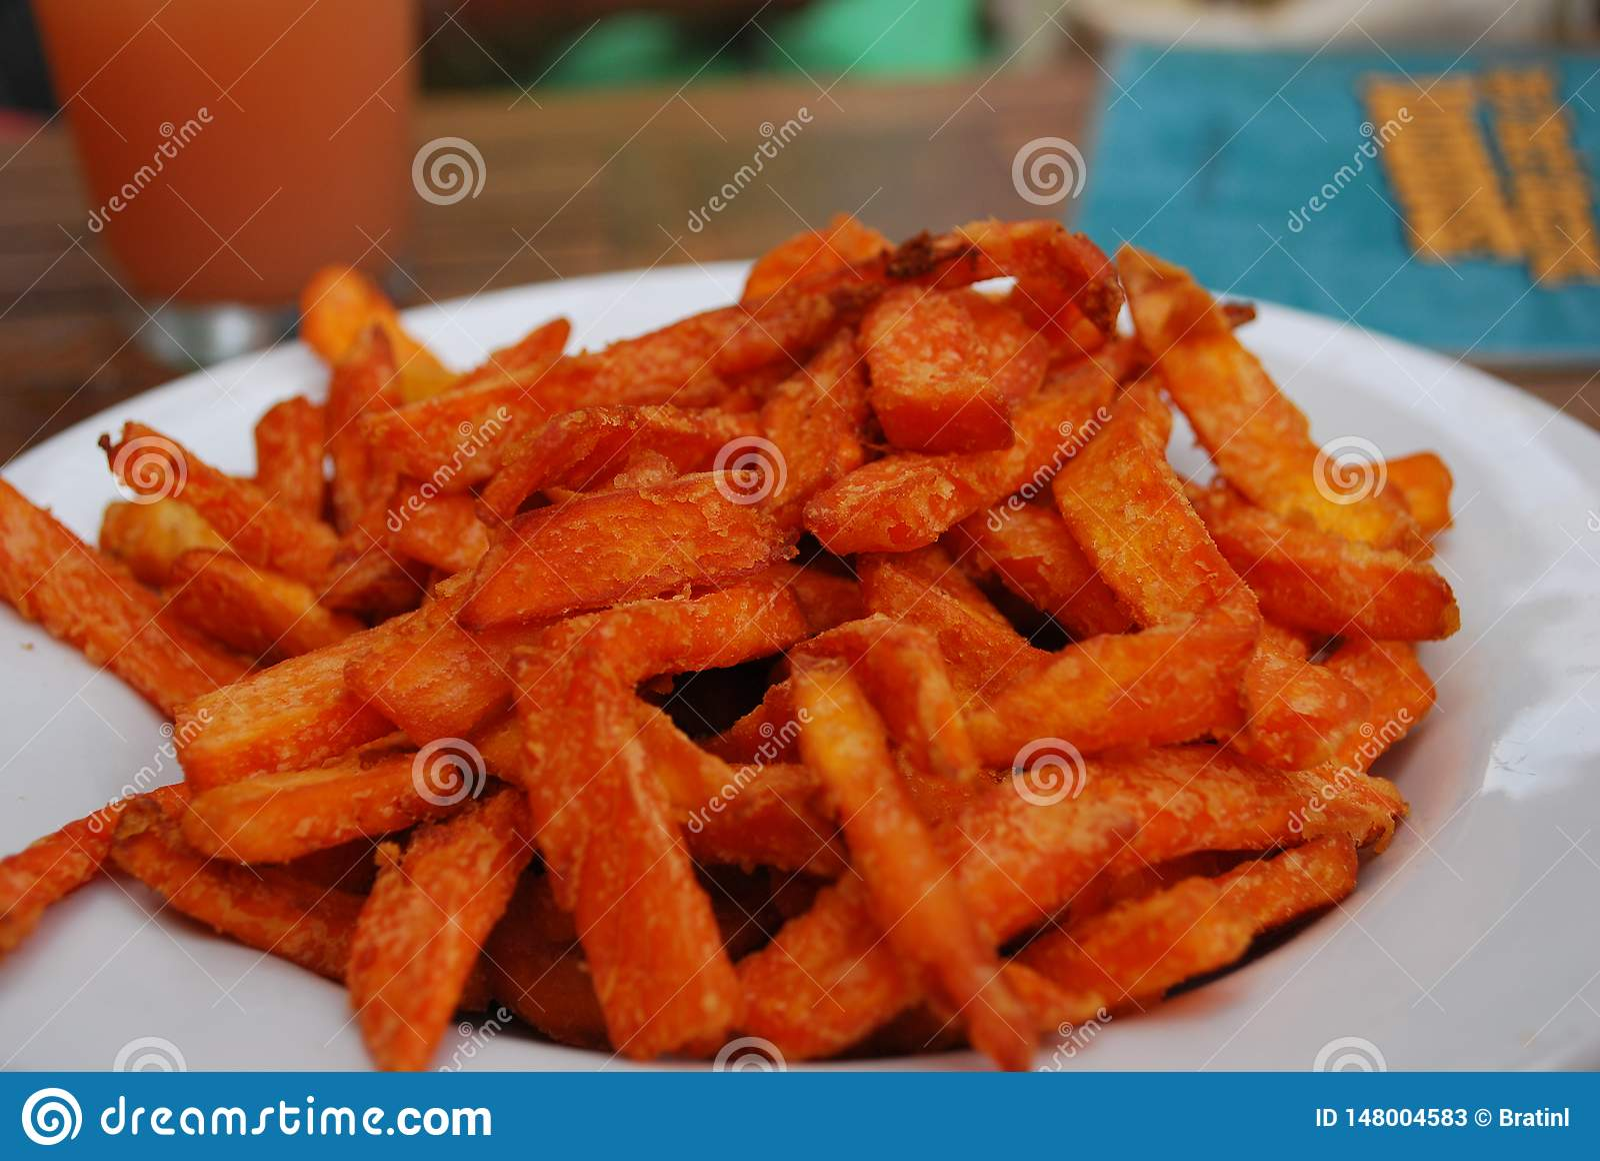 Batatas fritas da batata doce deliciosas